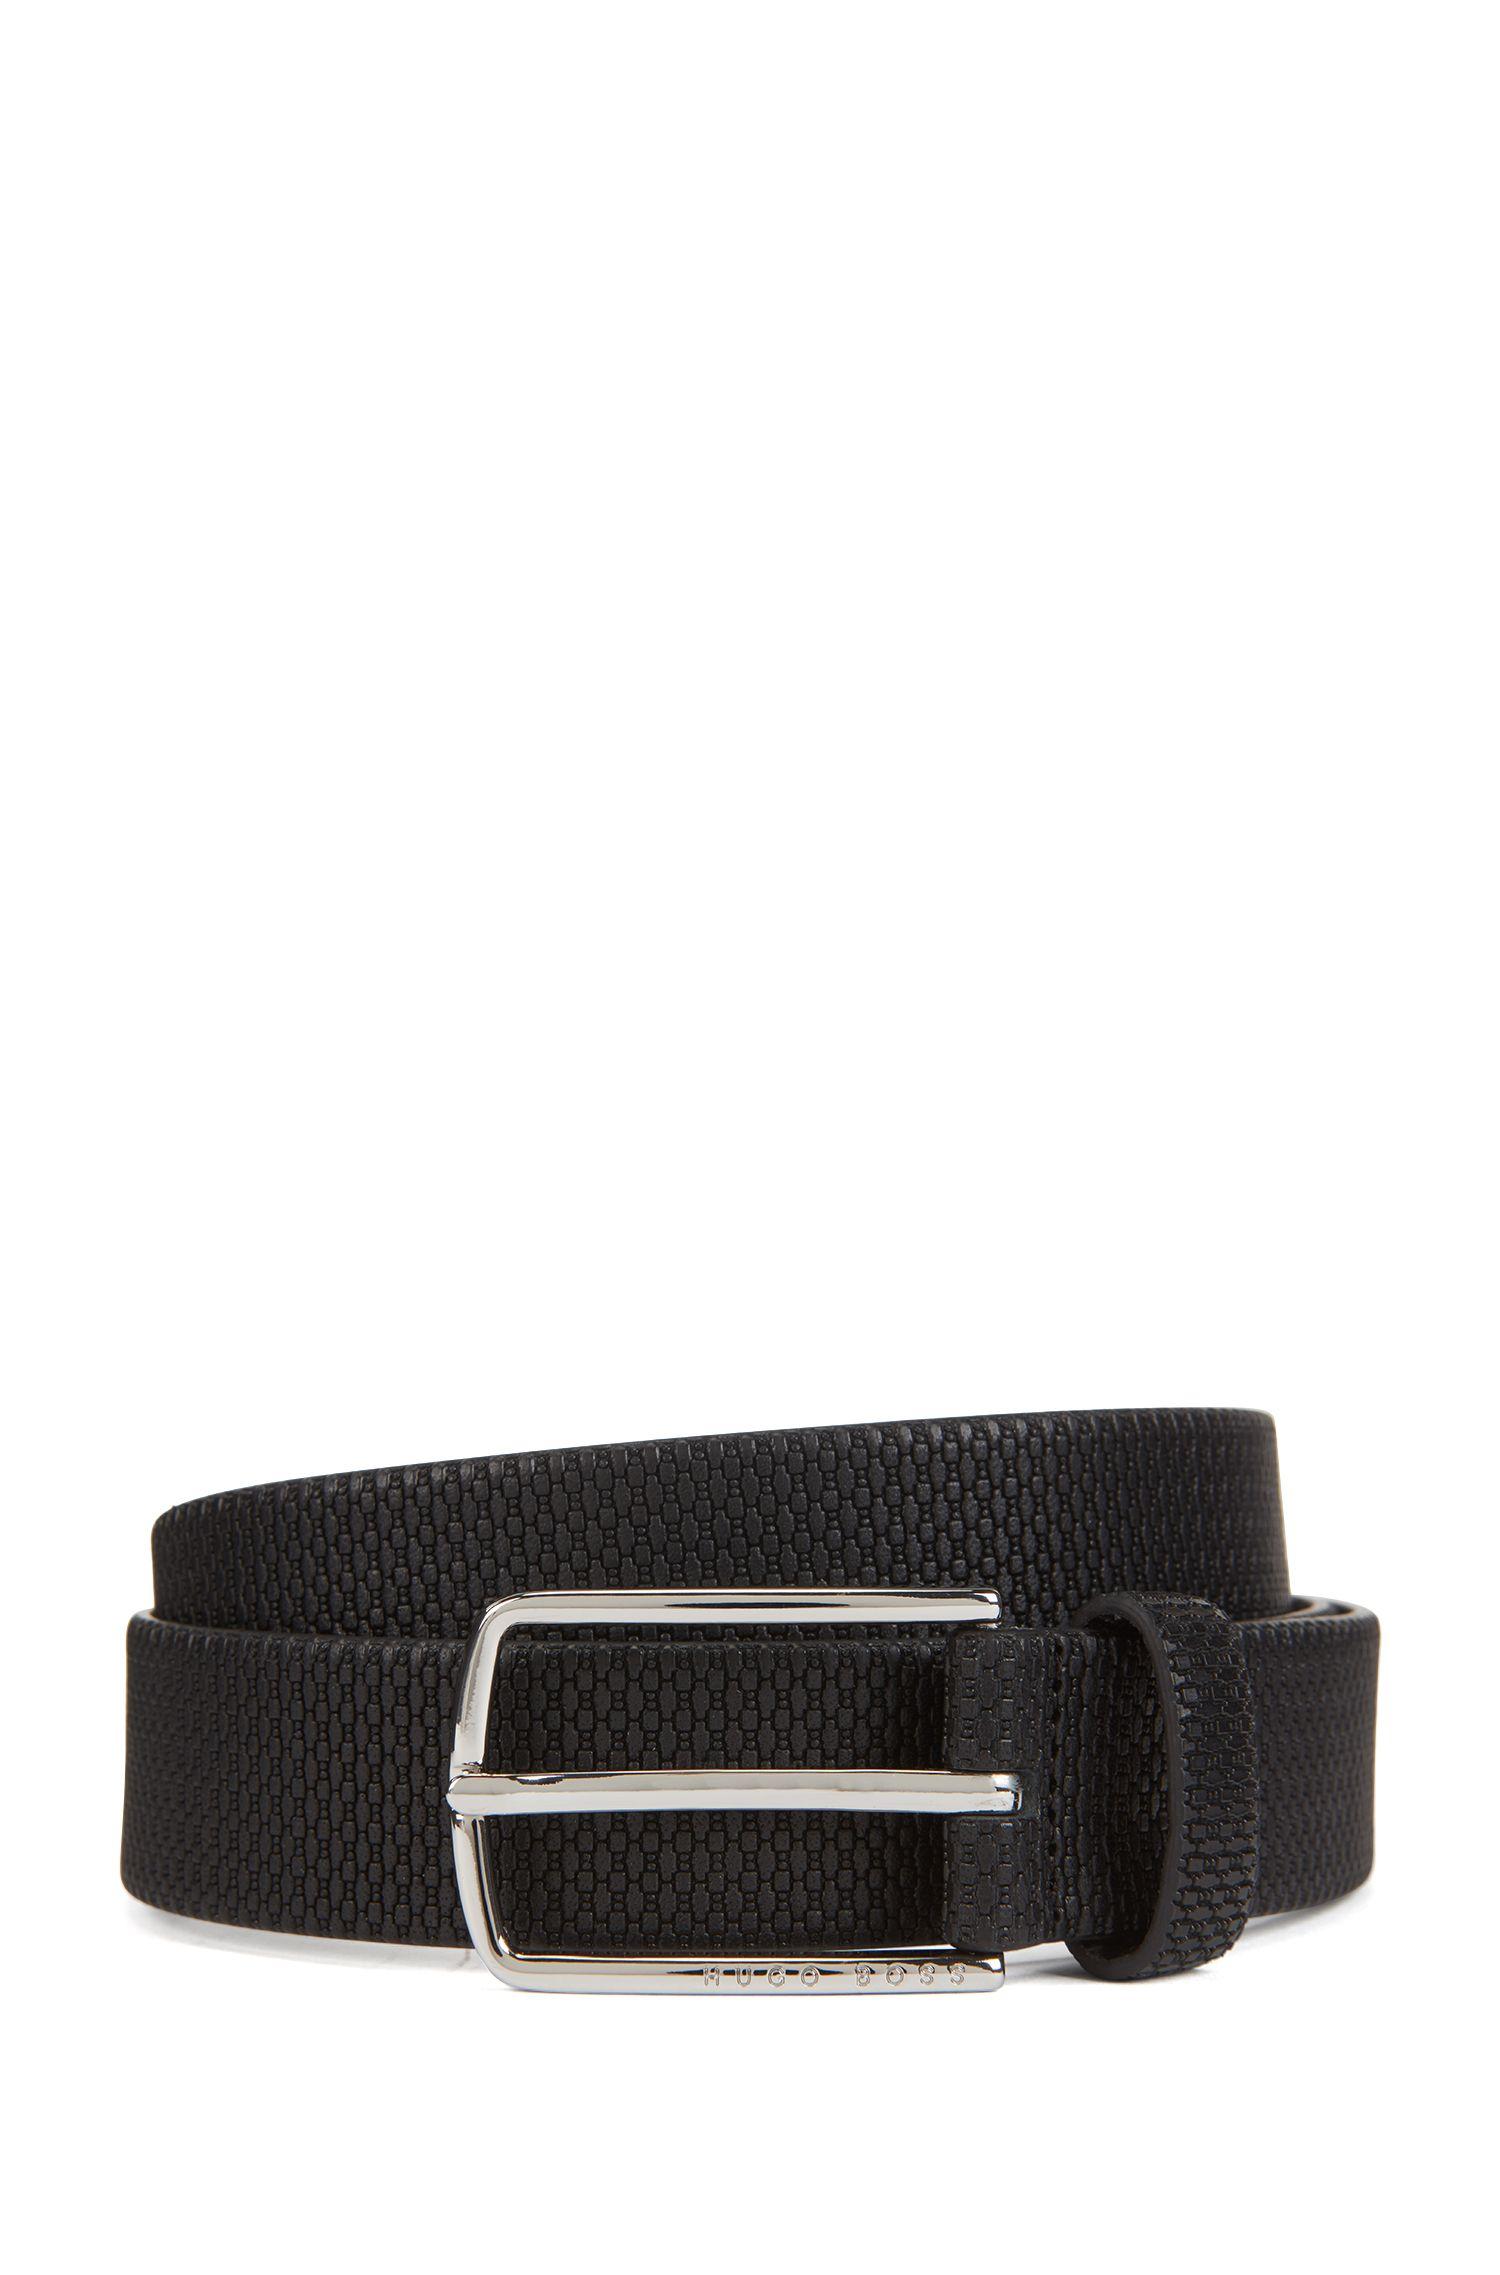 Monogram-embossed leather belt with polished hardware, Black